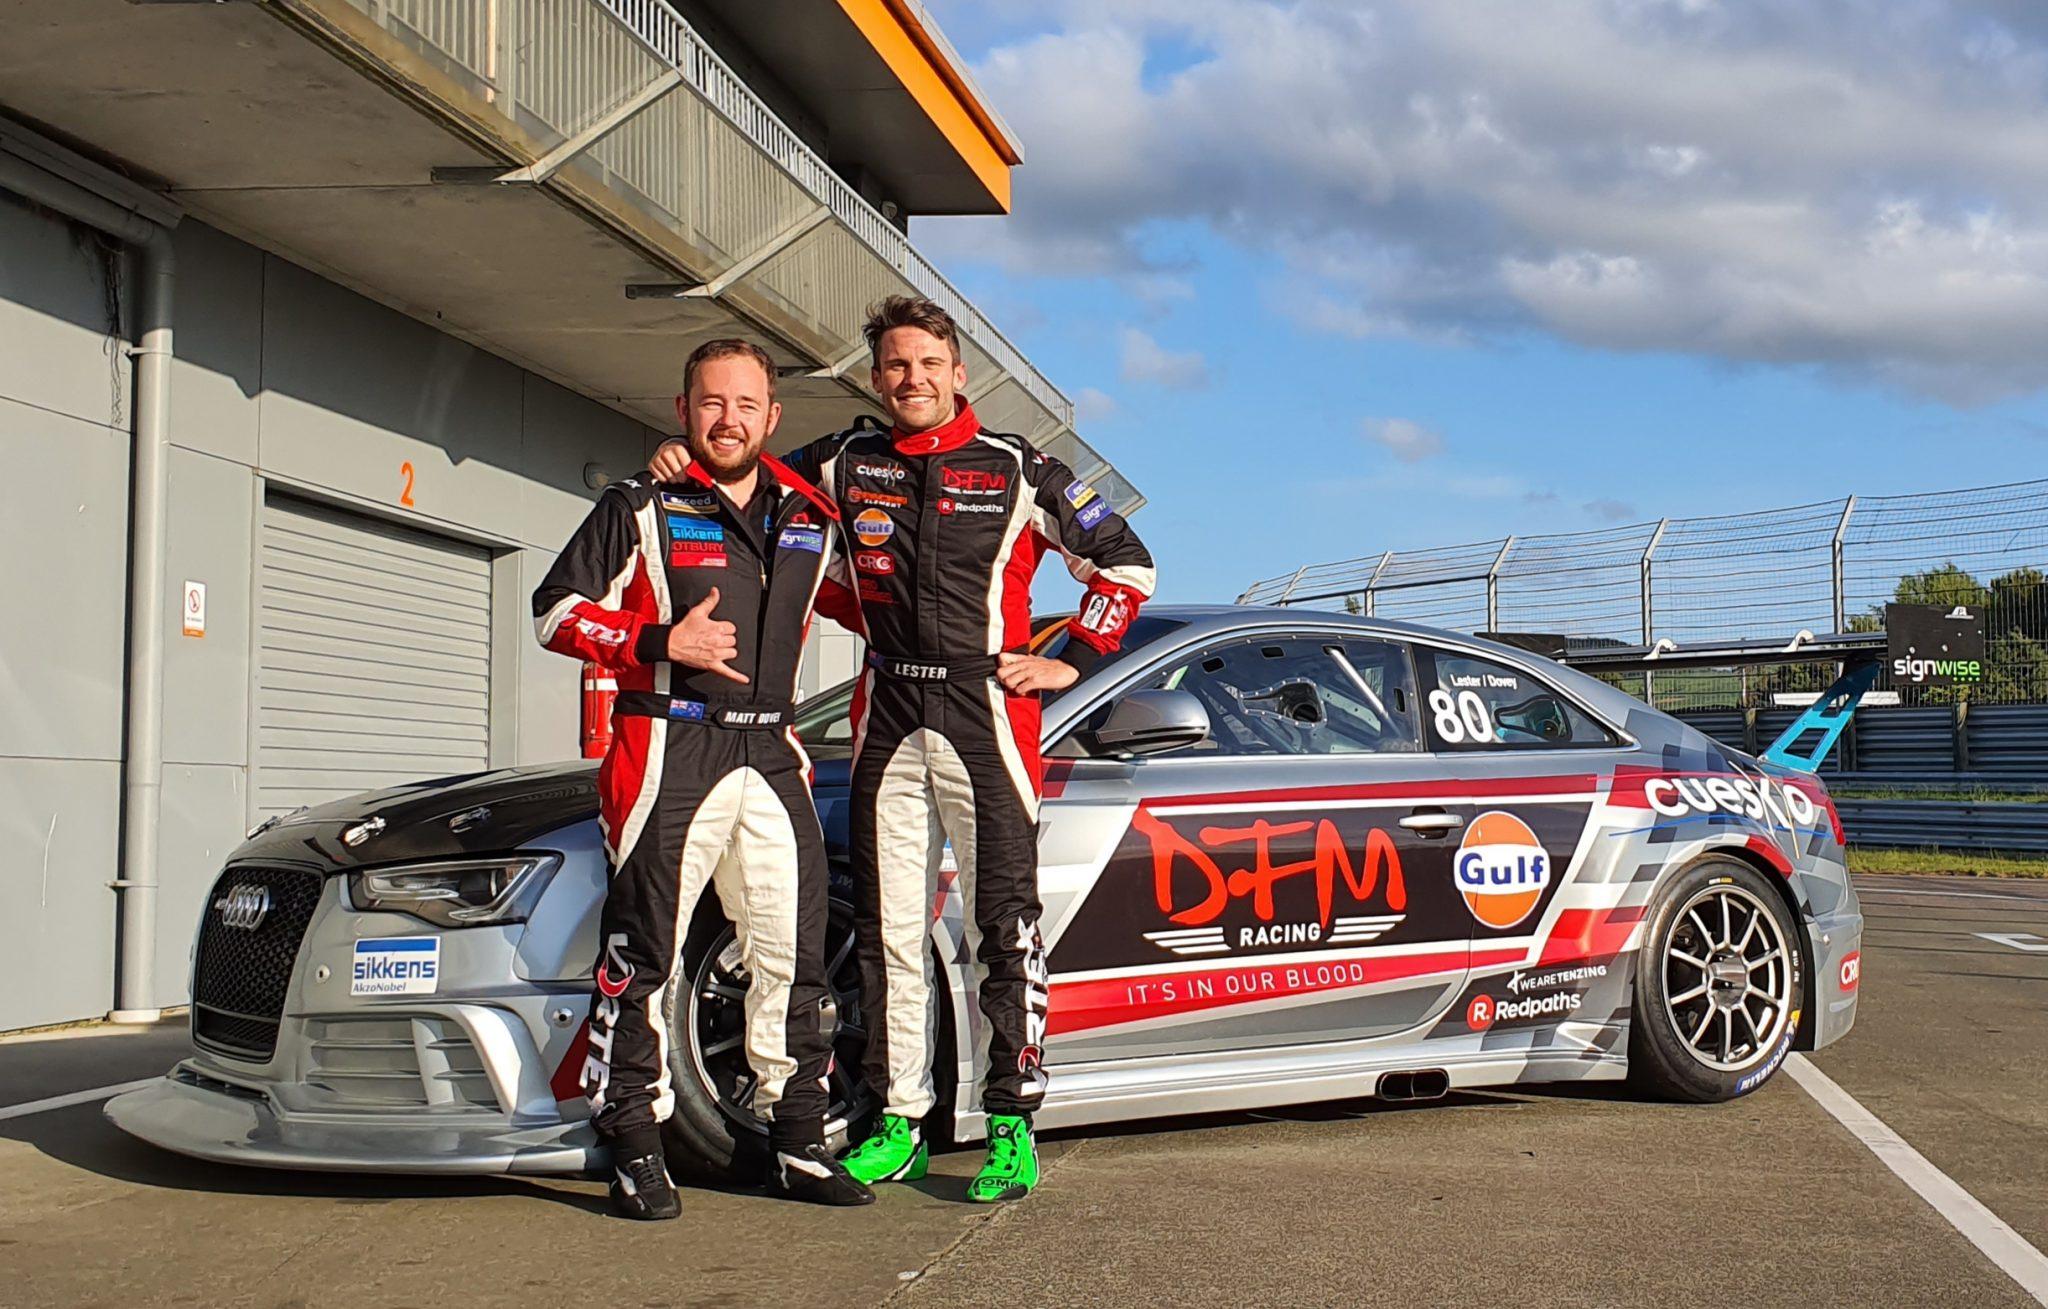 DFM Racing Audi V8 with Jono Lester